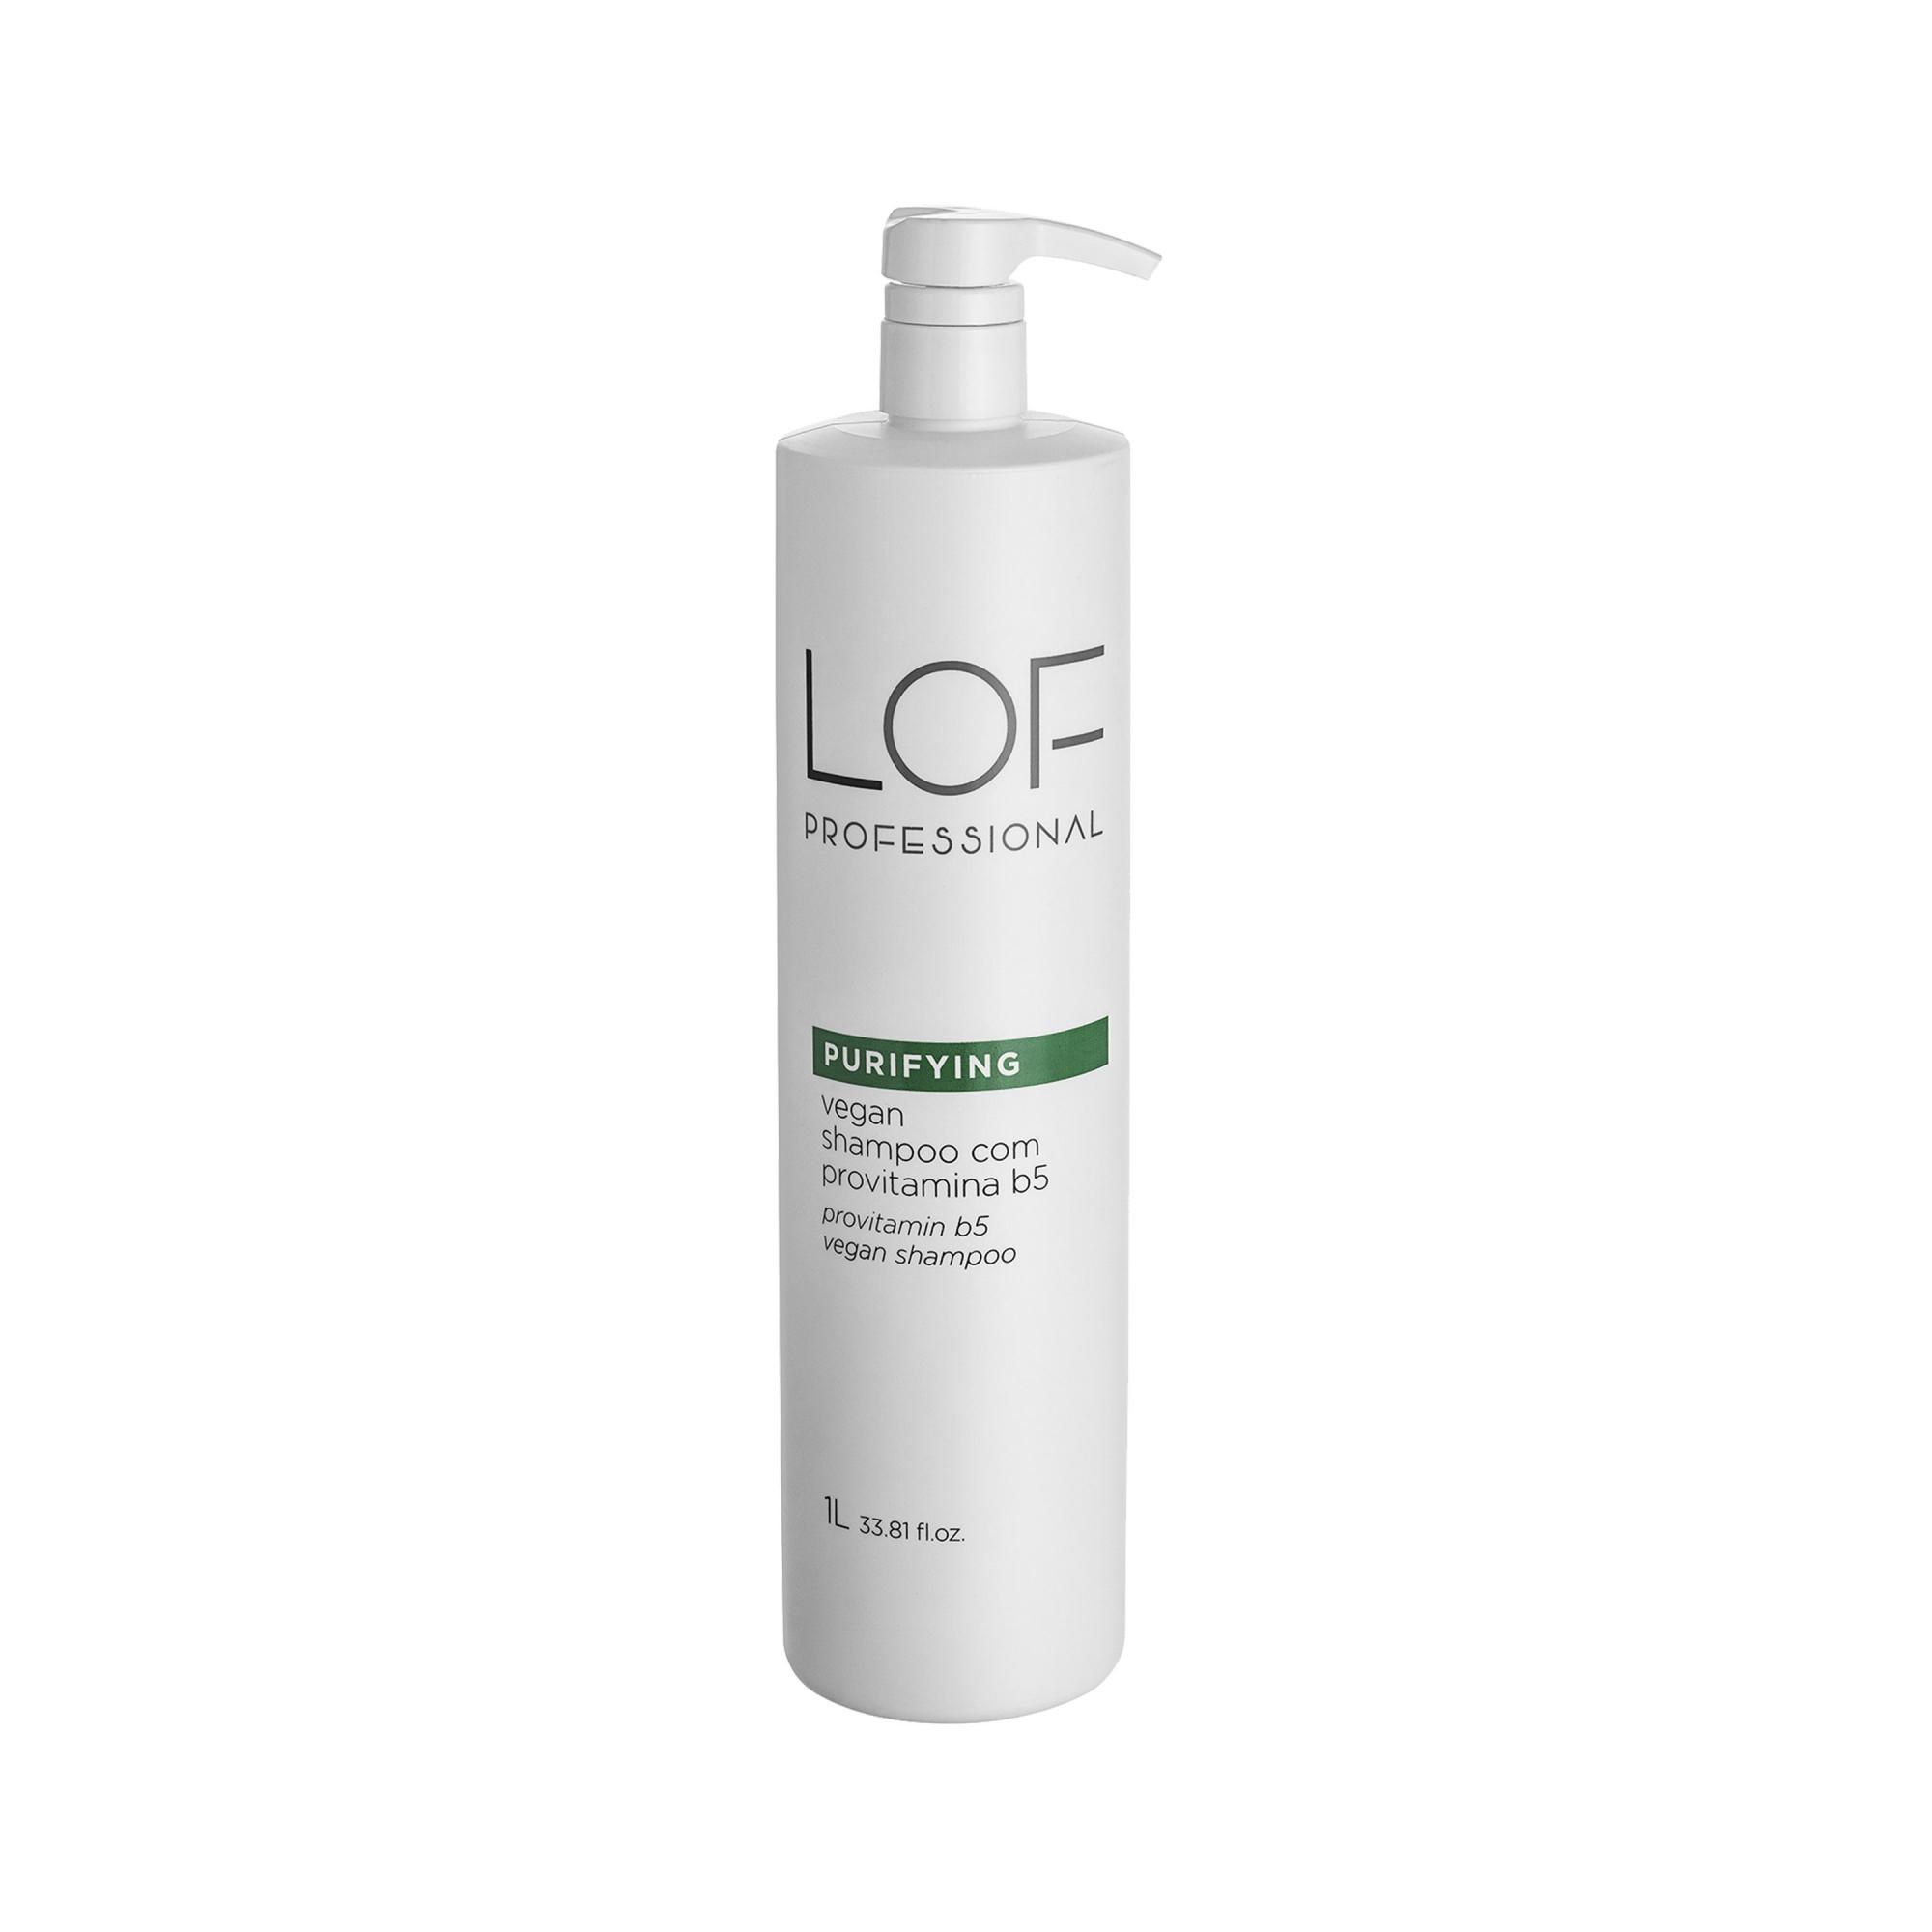 Vegan Shampoo Purifying 1L